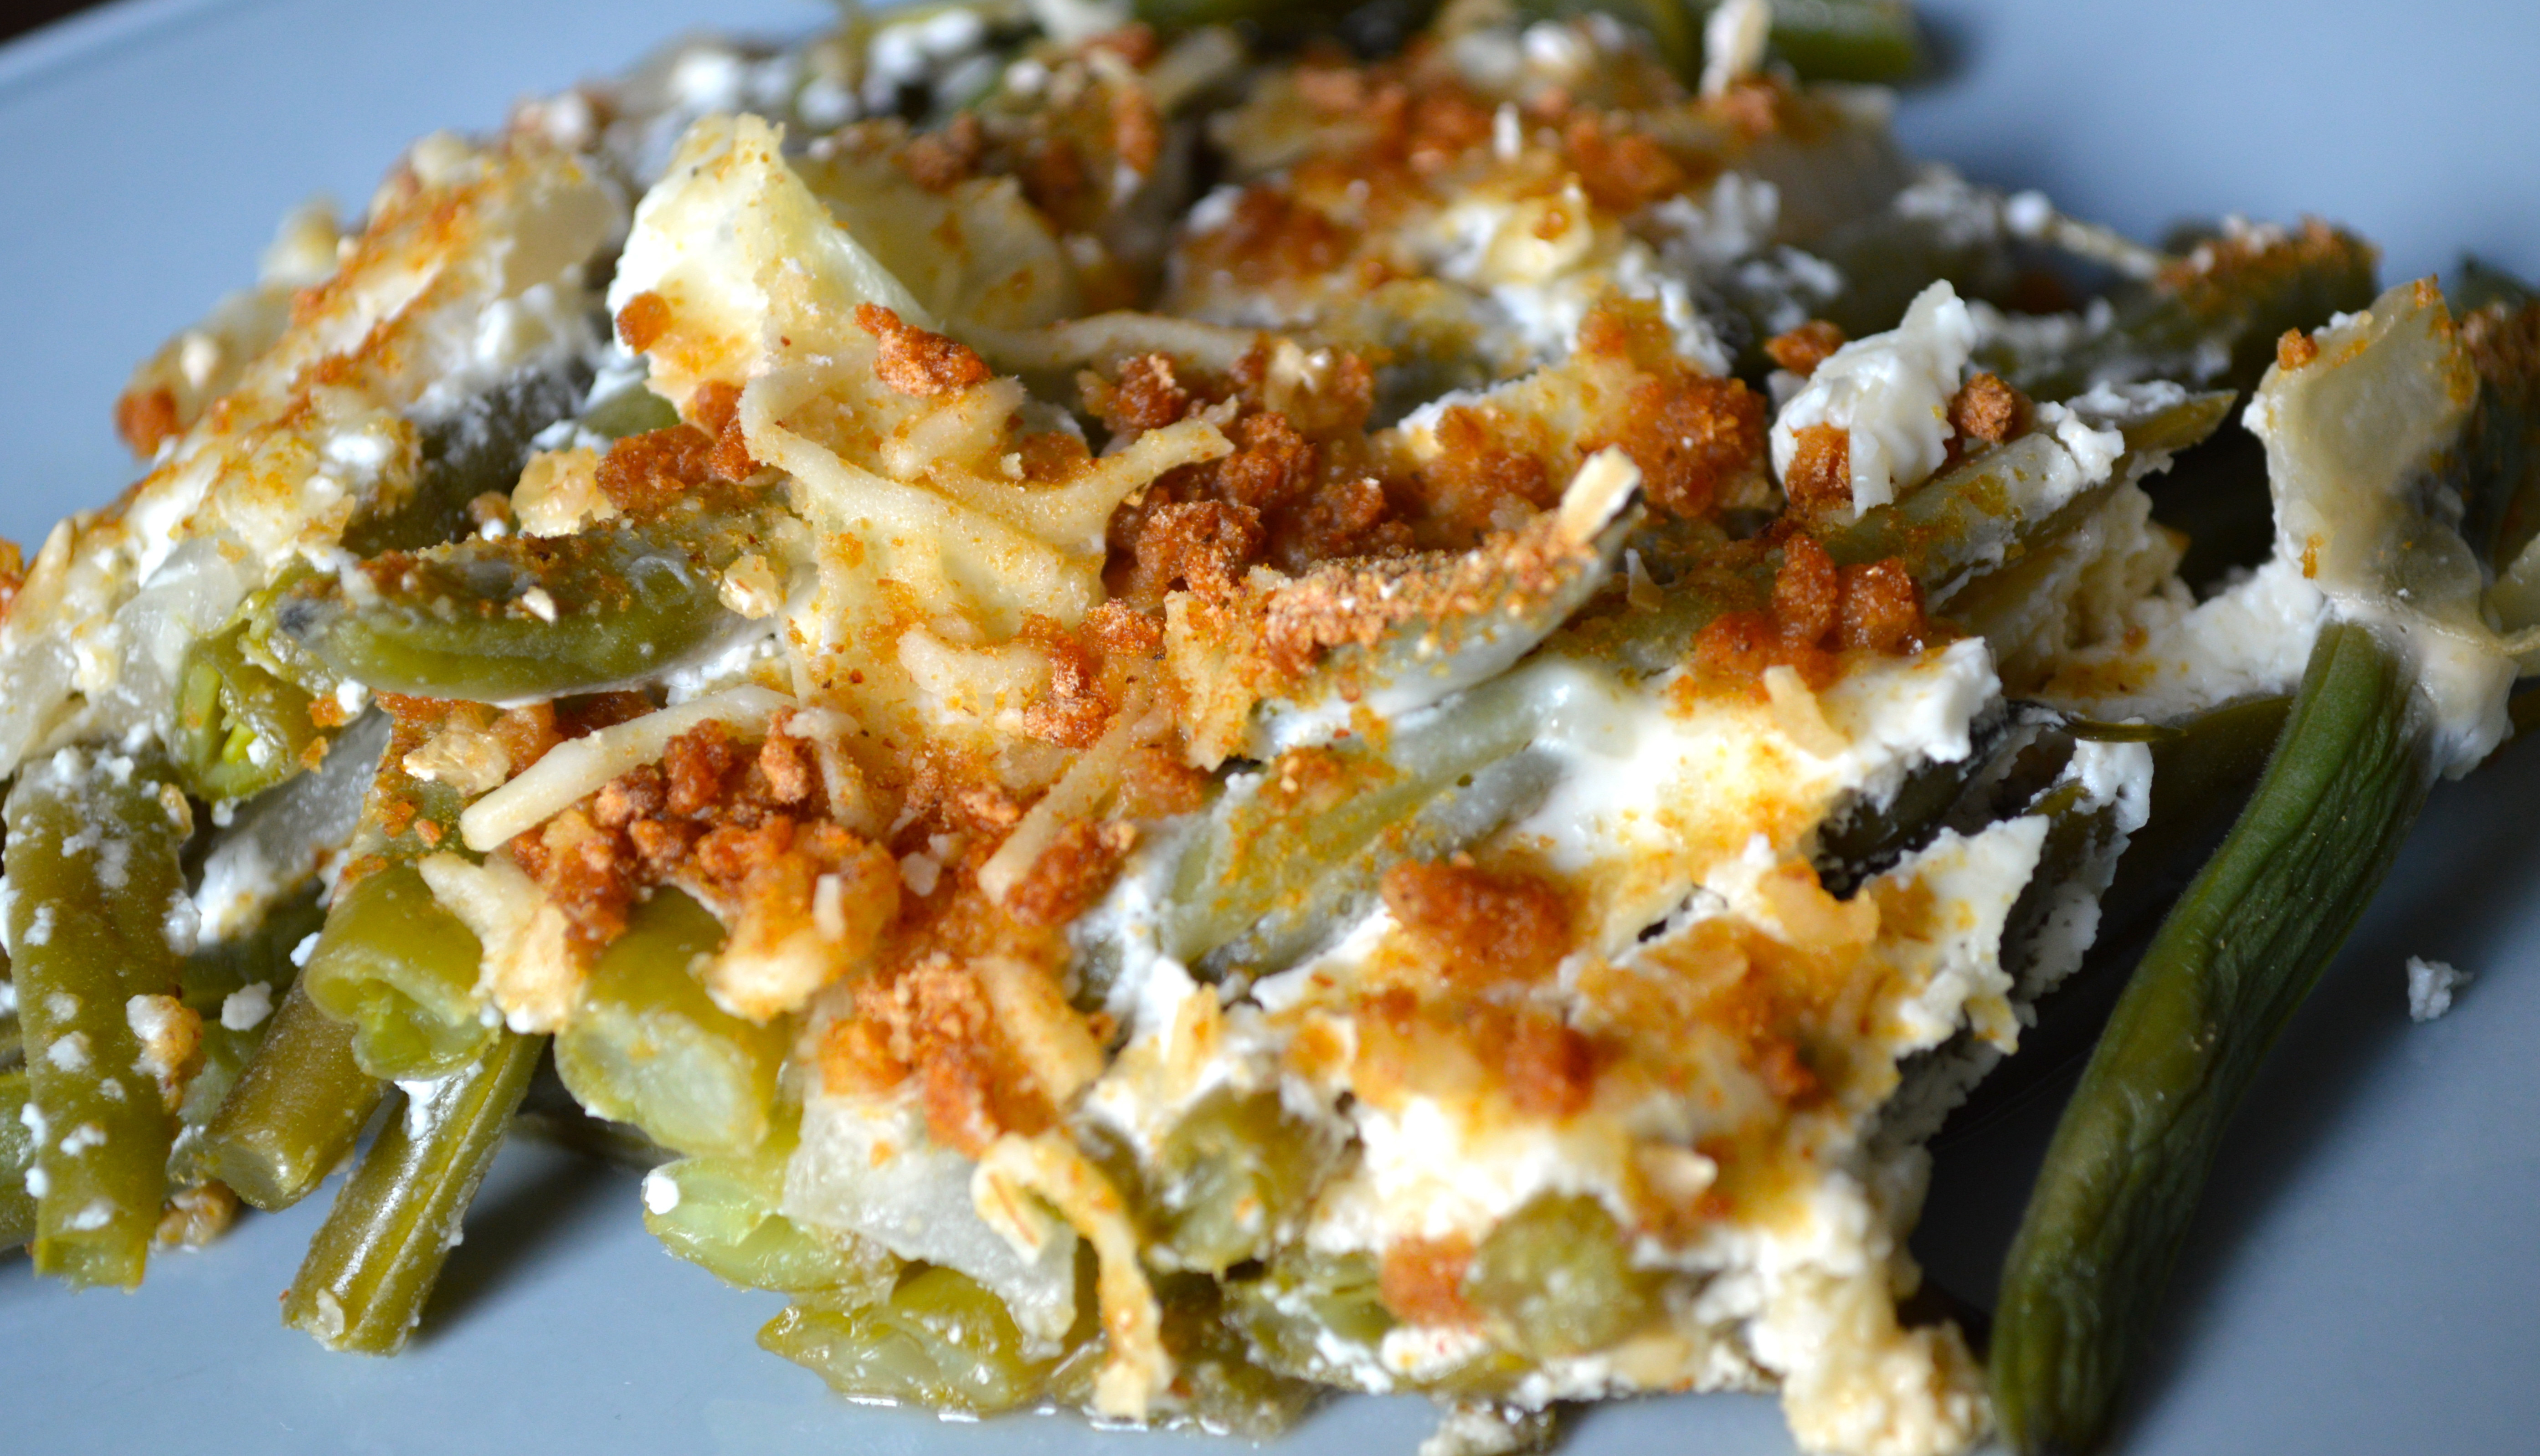 Low Cholesterol Food Recipes  Green Bean Casserole = Low Cholesterol Food